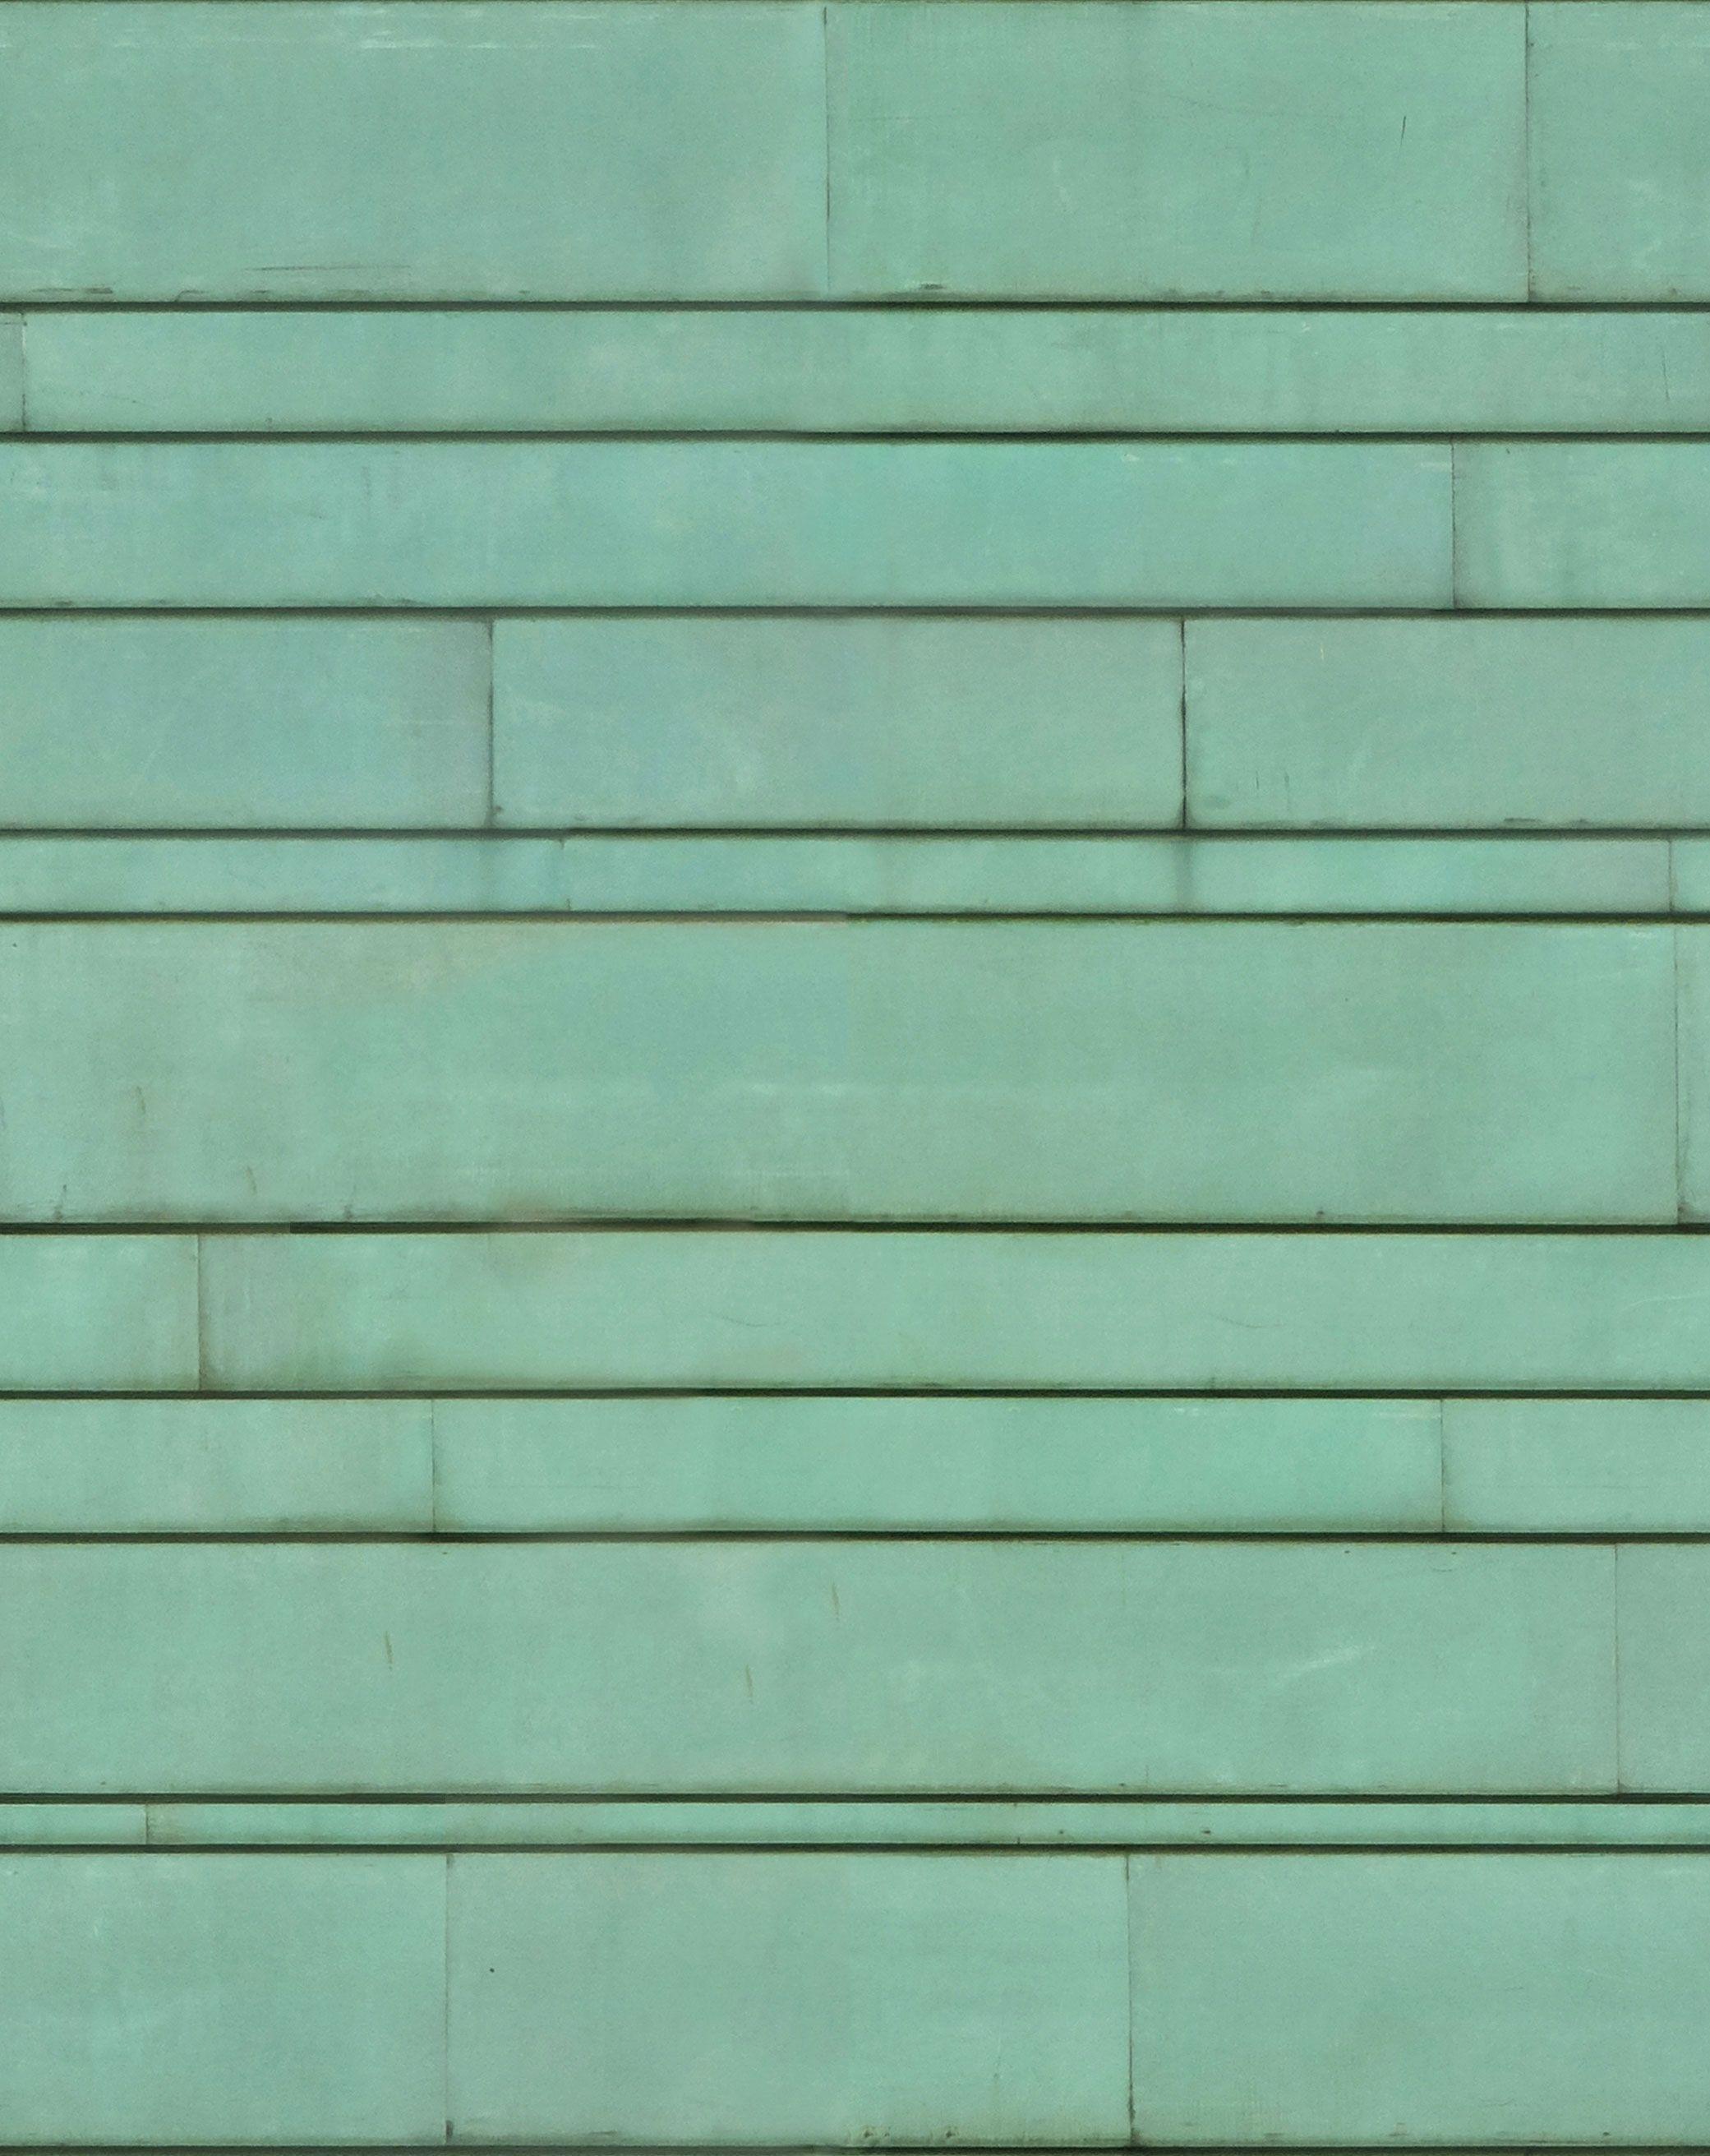 Green Copper Sheeting Seamless Texture Materials